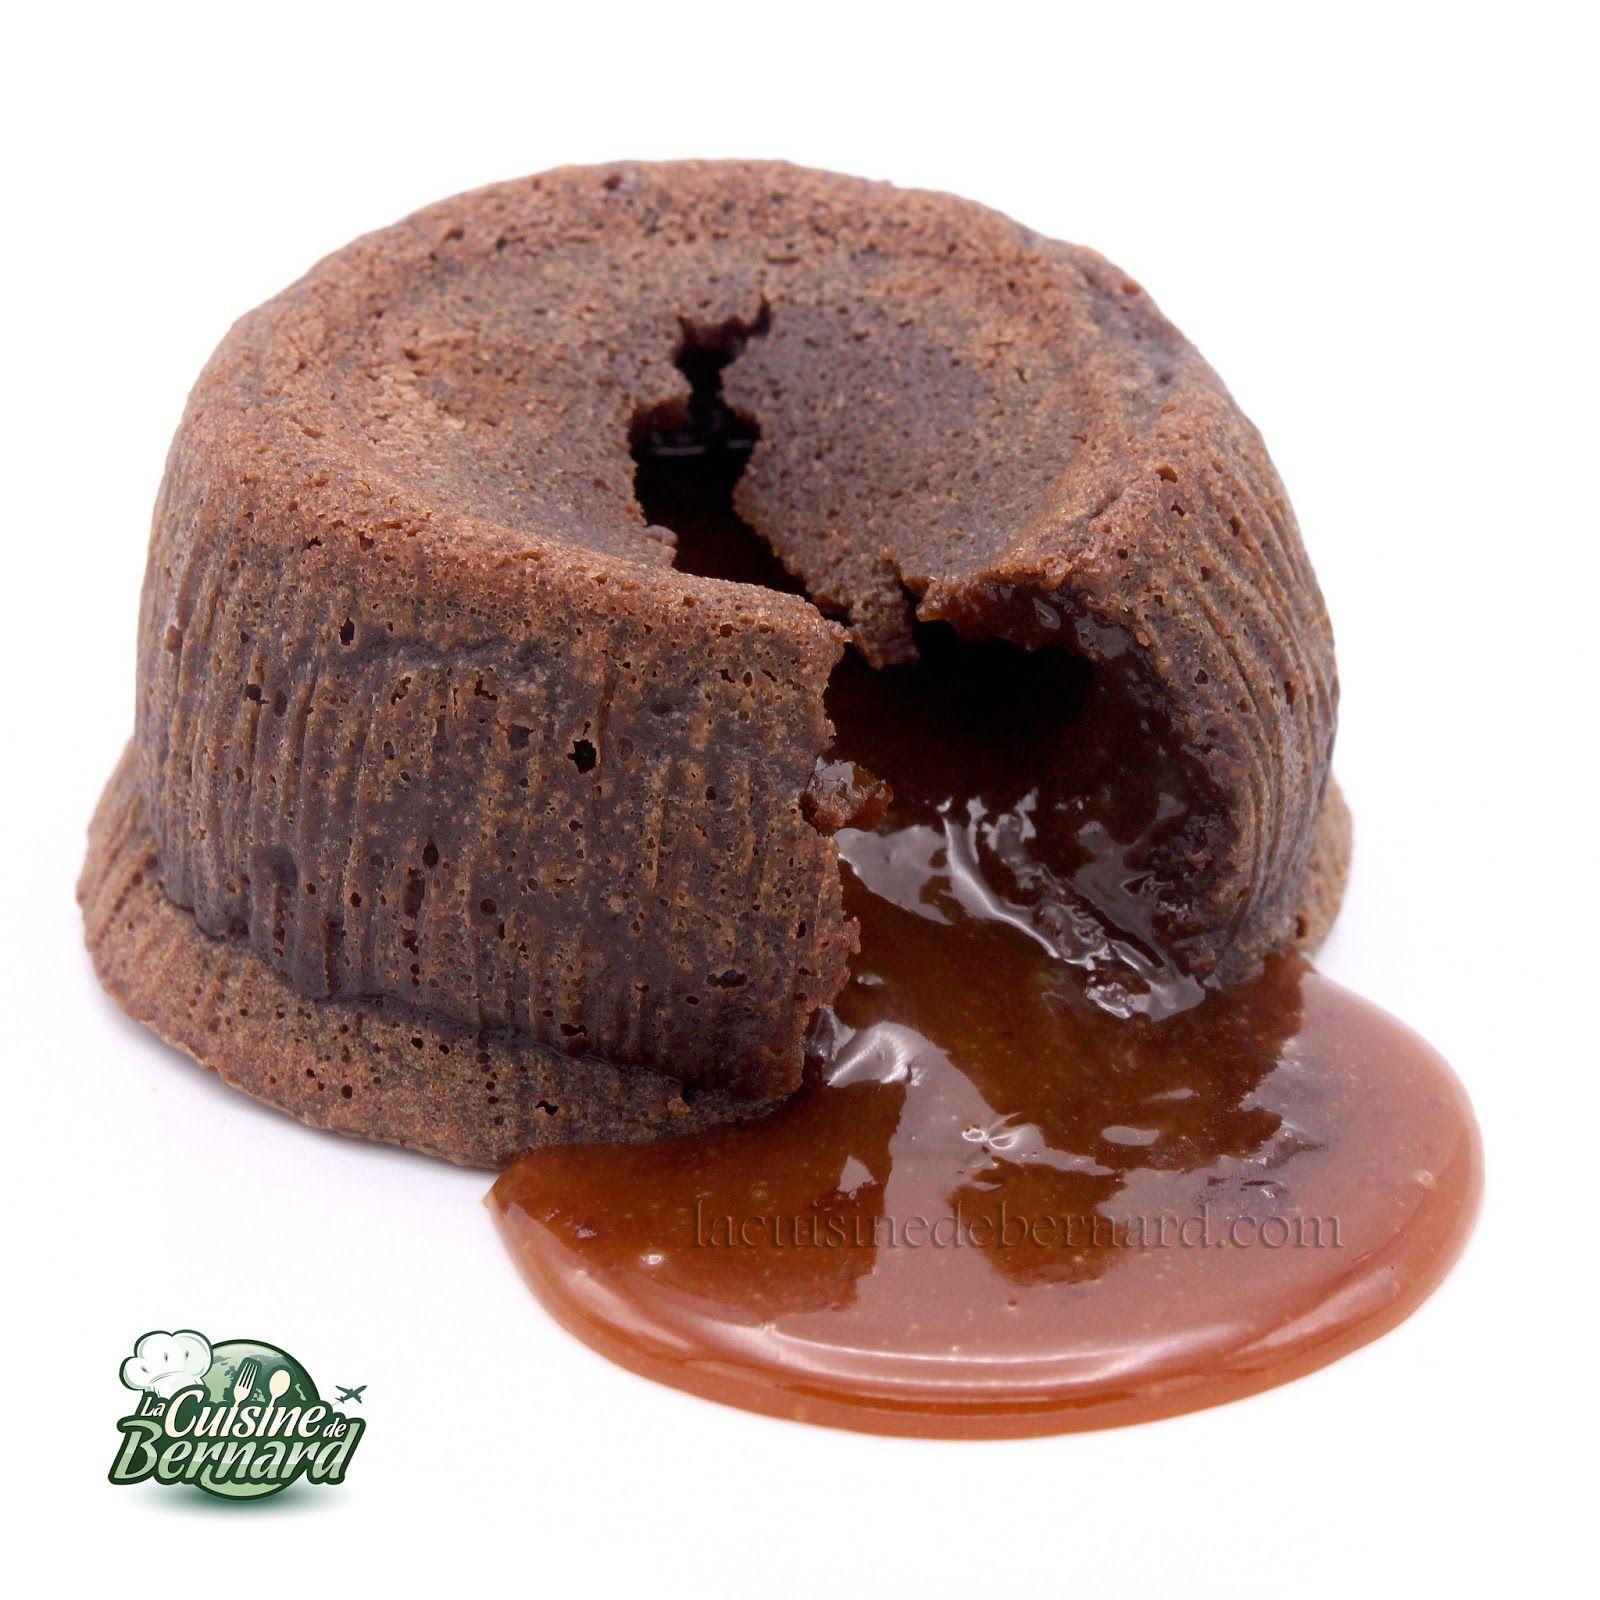 La Cuisine de Bernard : Mi Cuit au chocolat, cœur caramel coulant